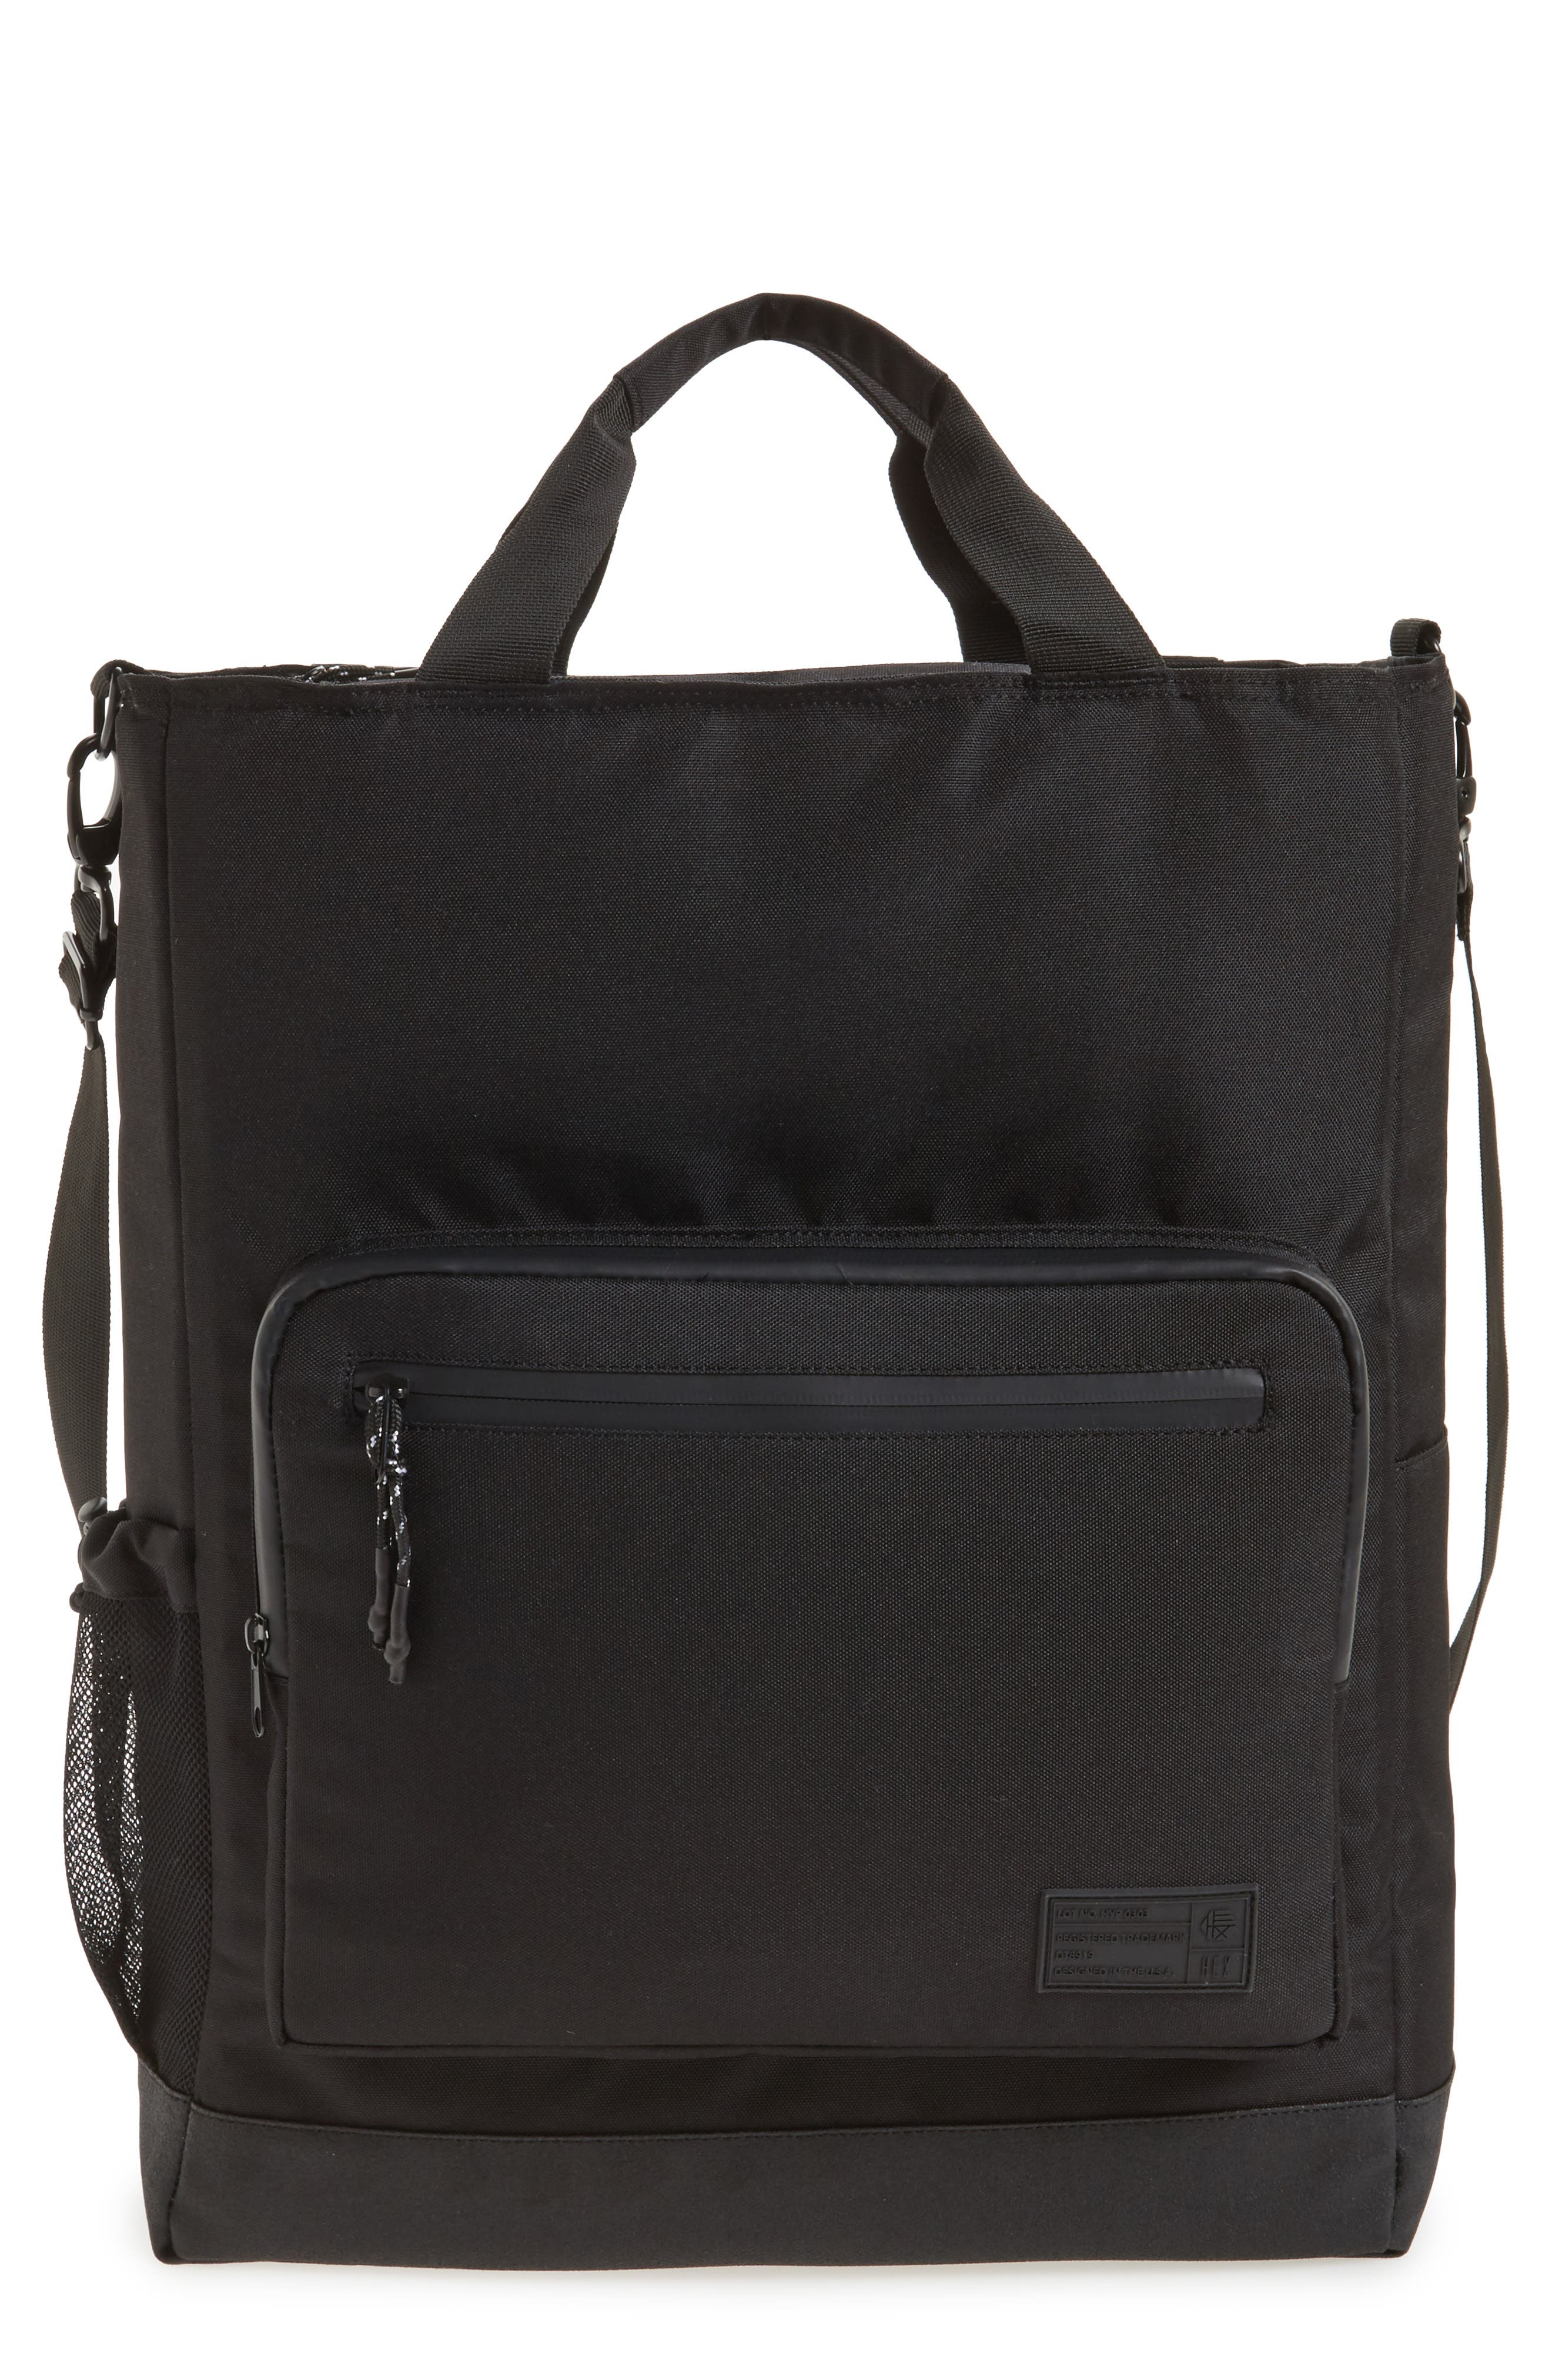 HEX Surf Tote Bag